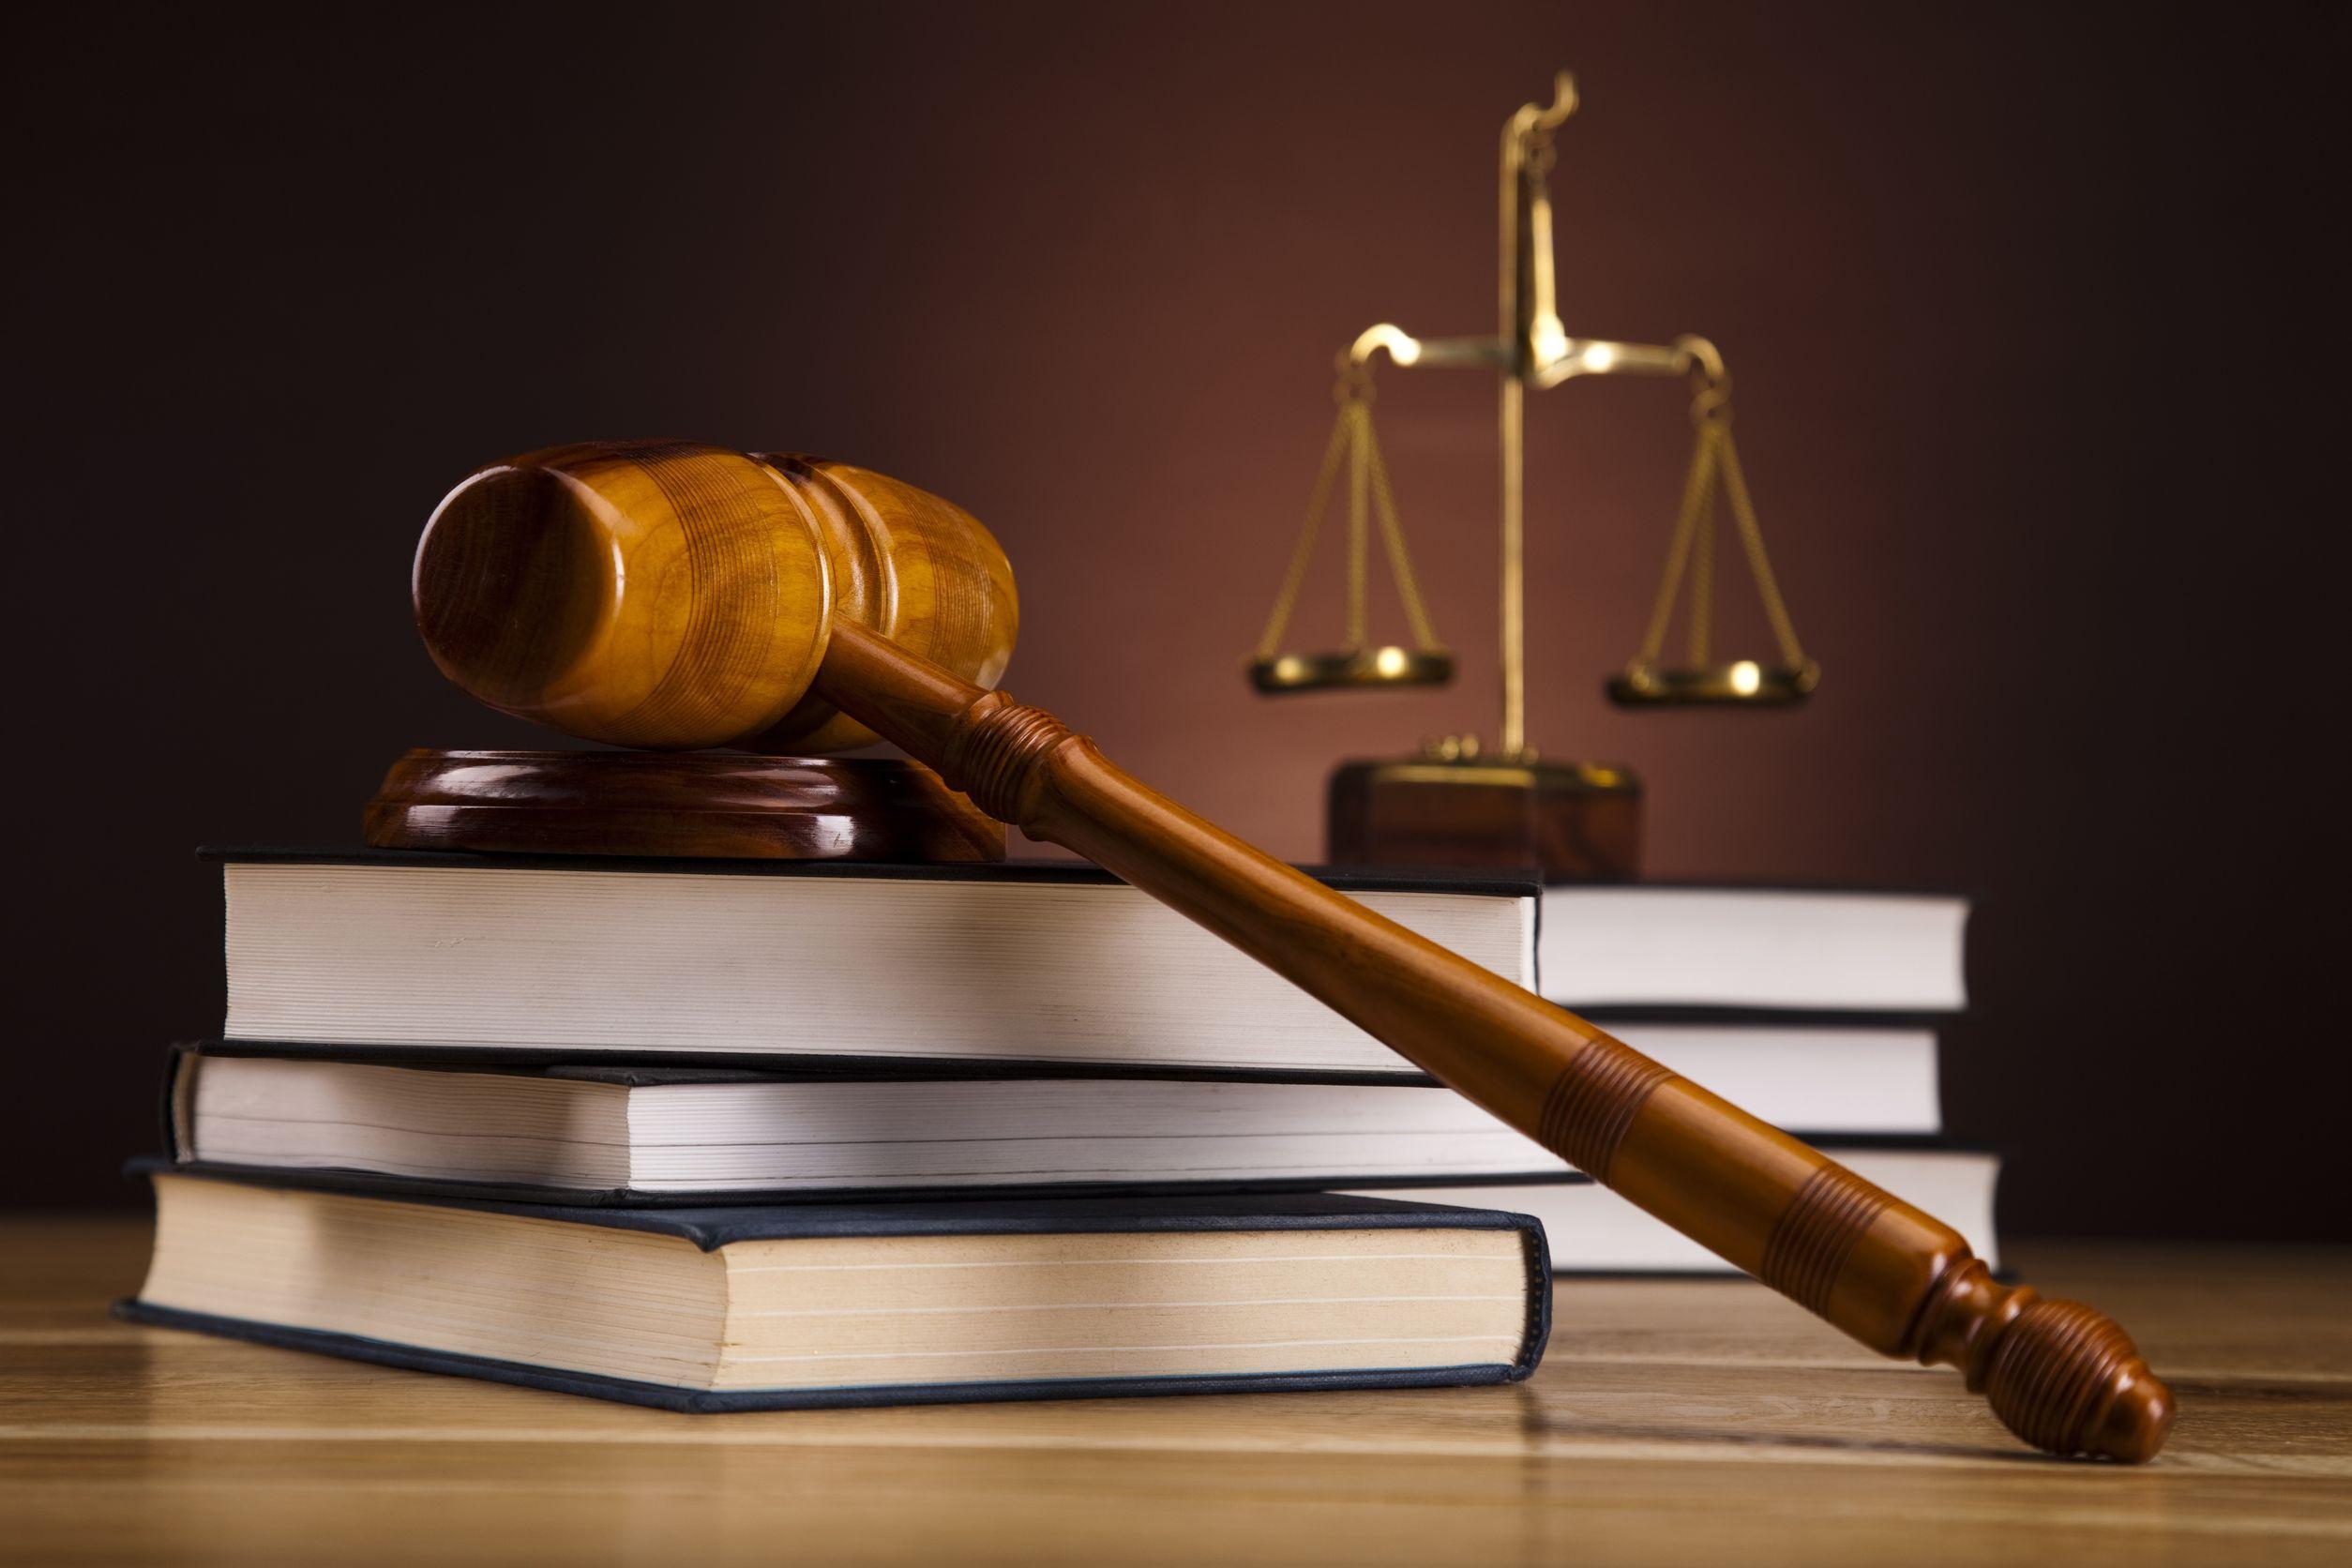 law-phd-degree-help